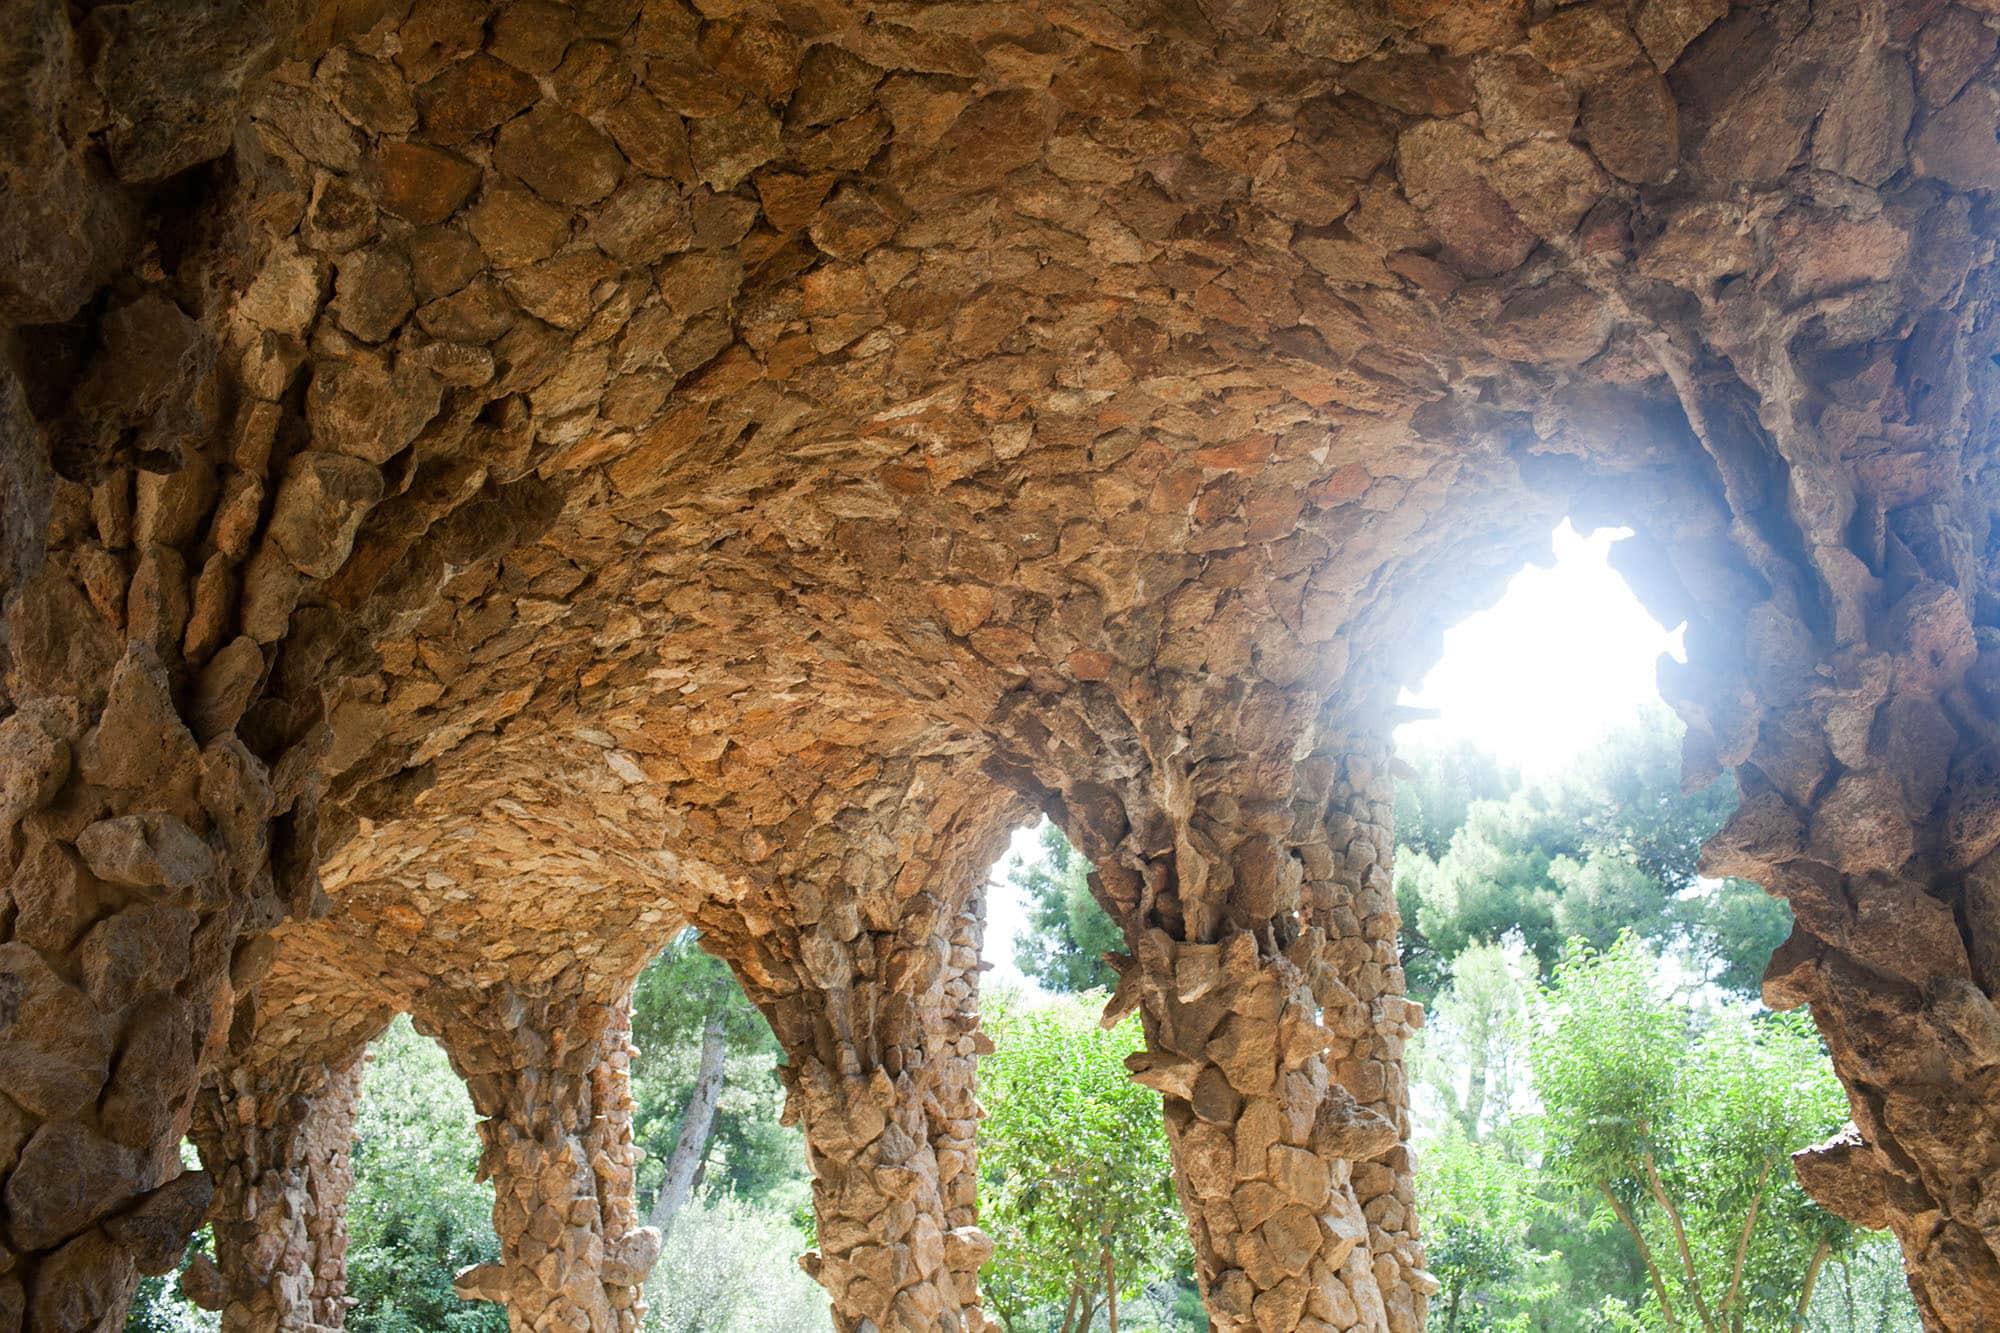 Park Güell, a Gaudi designed park, in Barcelona, Spain.